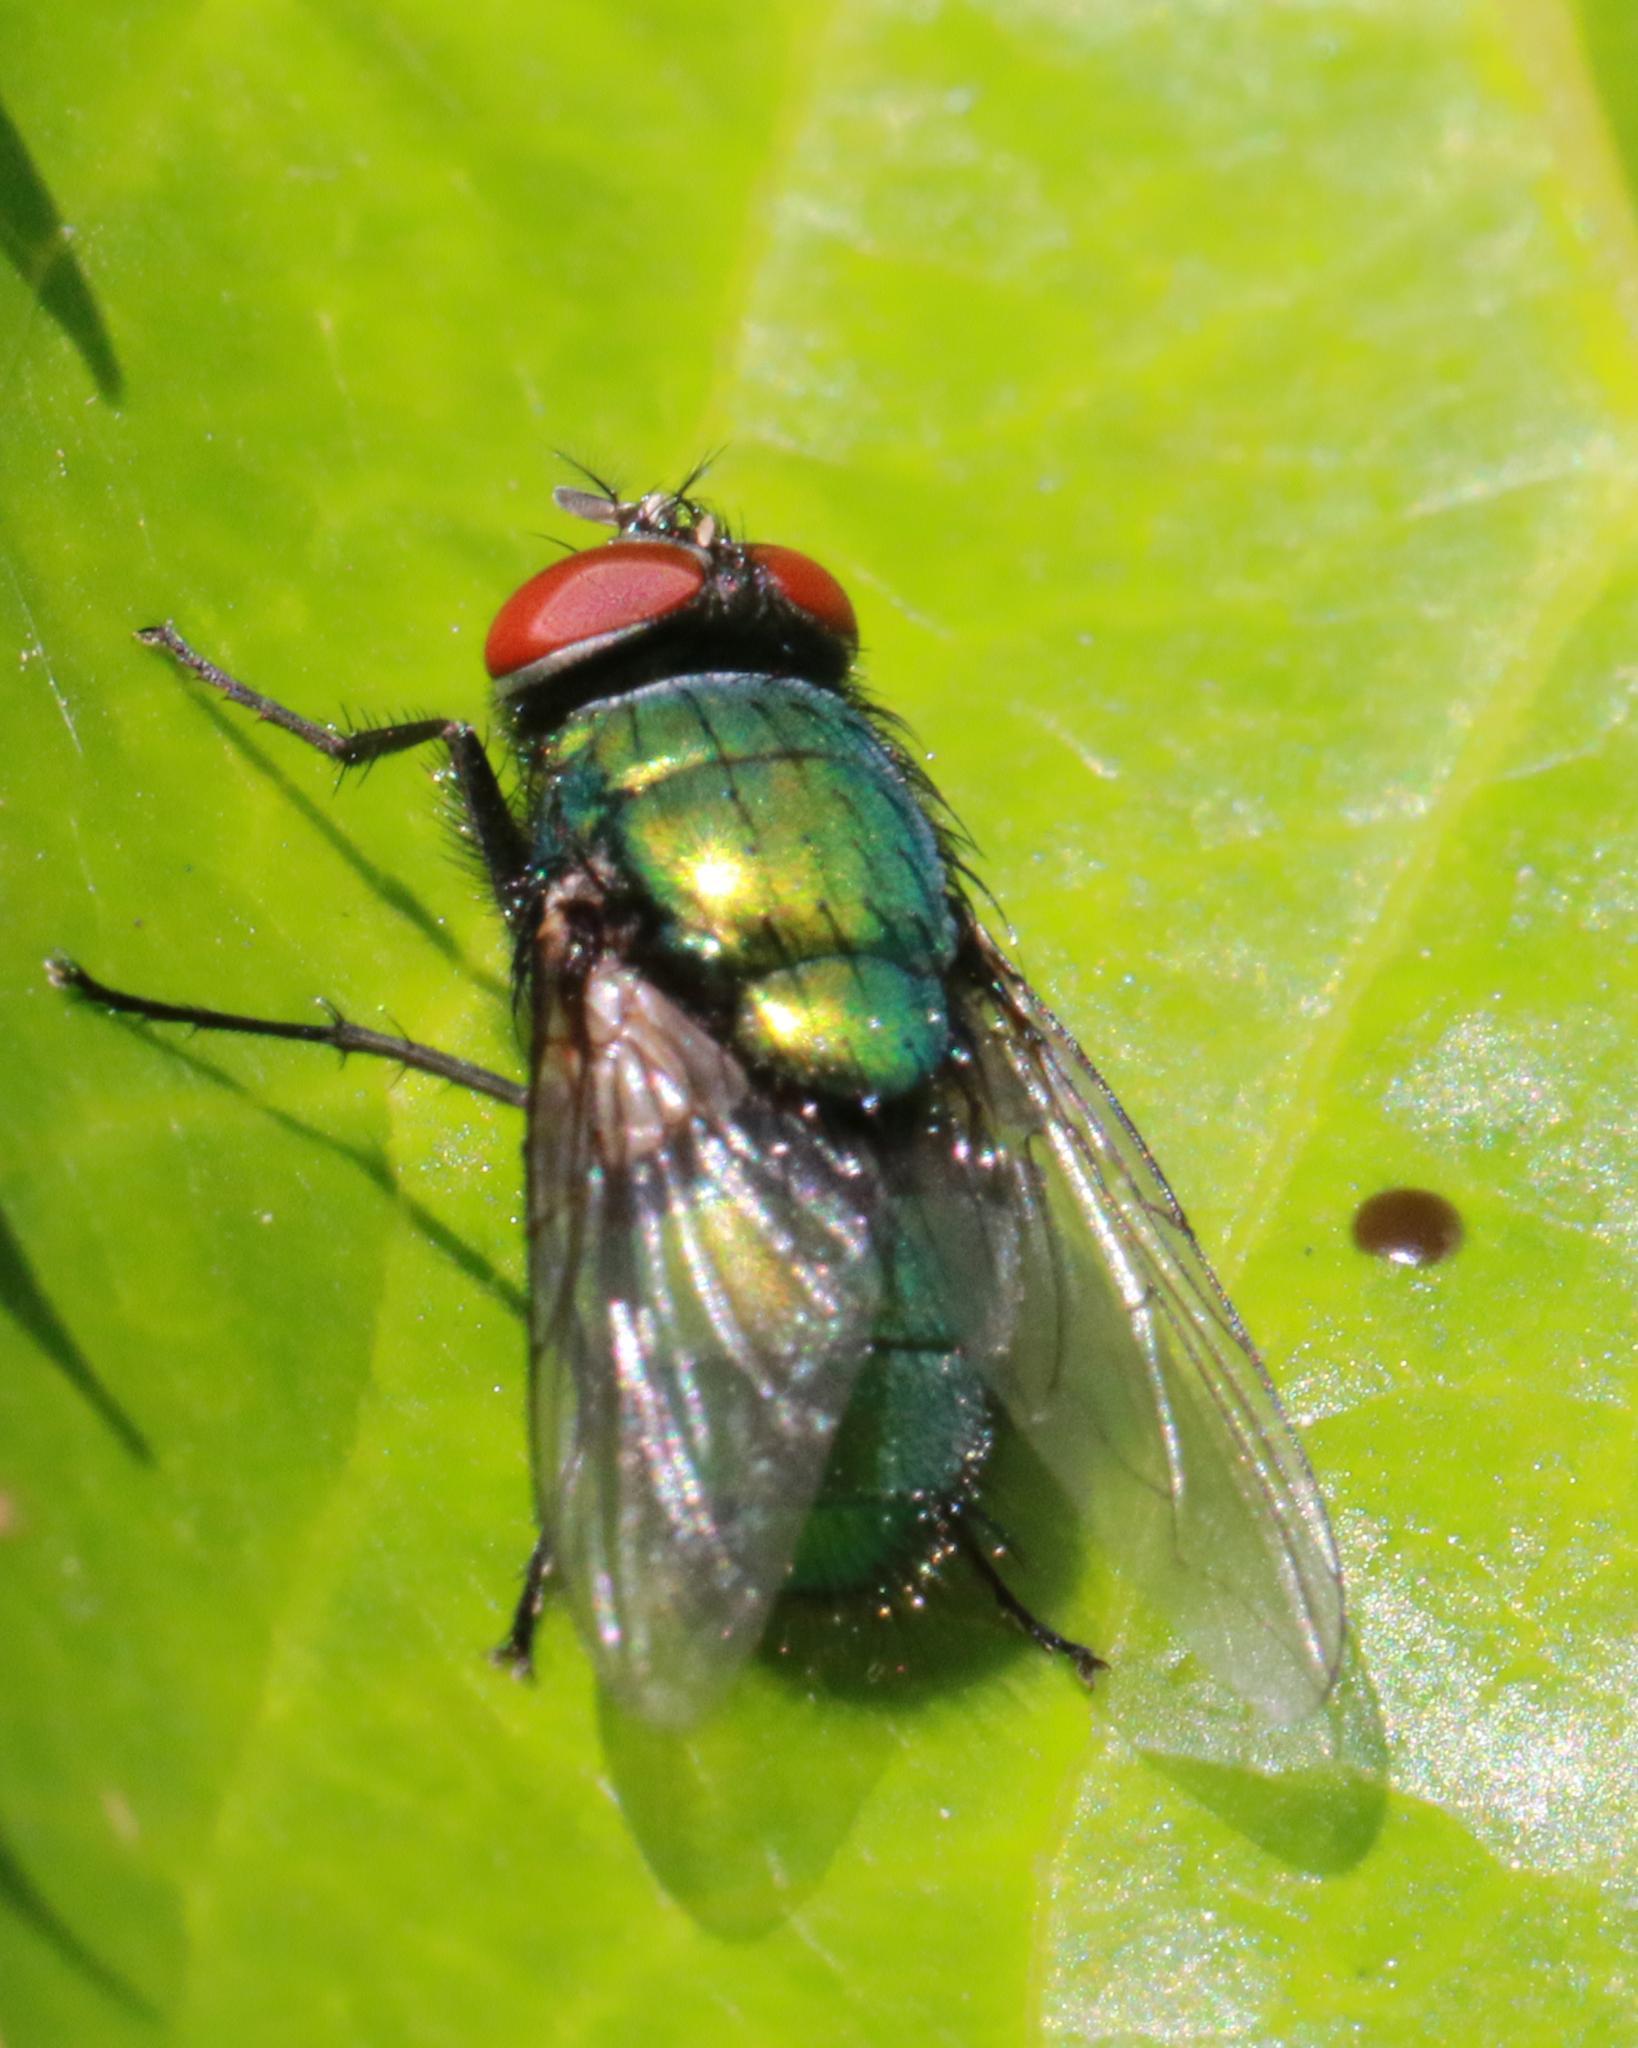 green bodied fly by Nicholas Rawsthorne